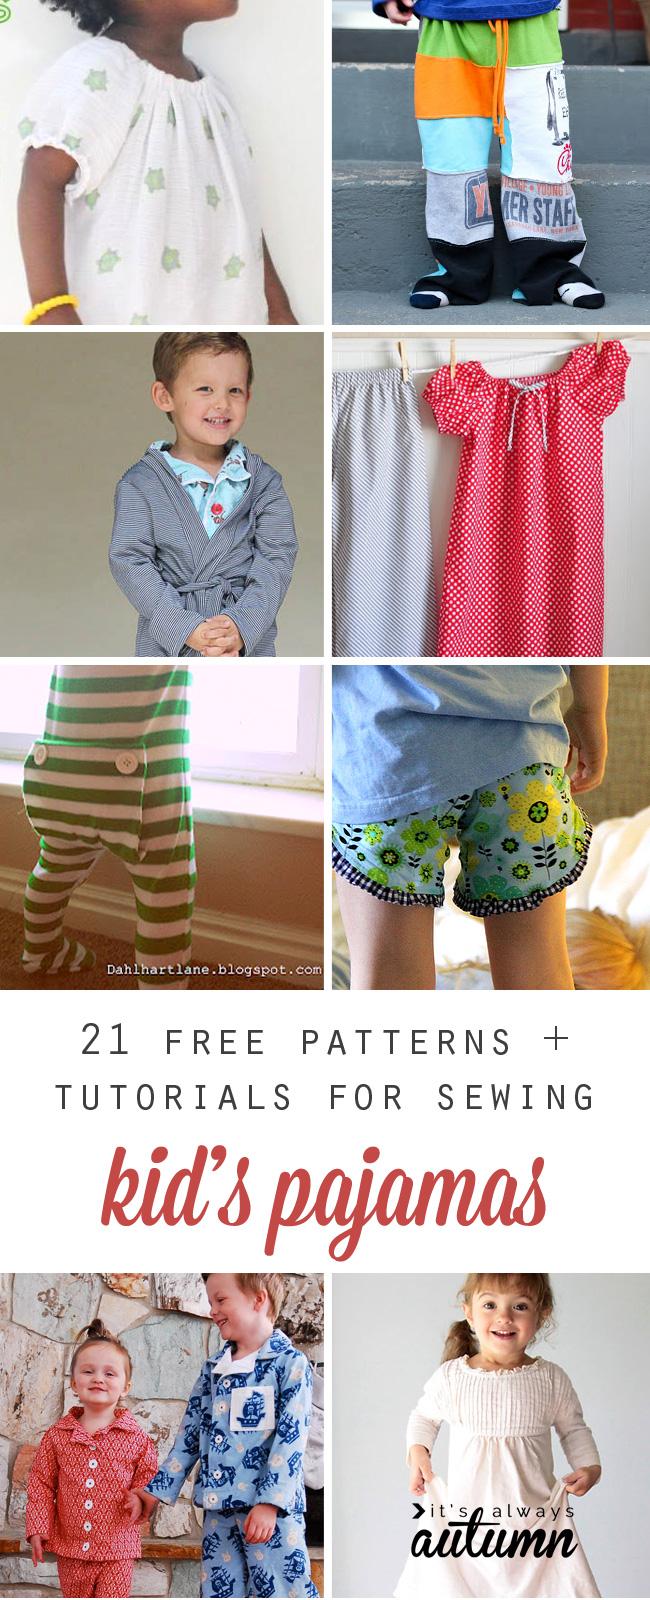 Collage of kids wearing pajamas made from free sewing patterns